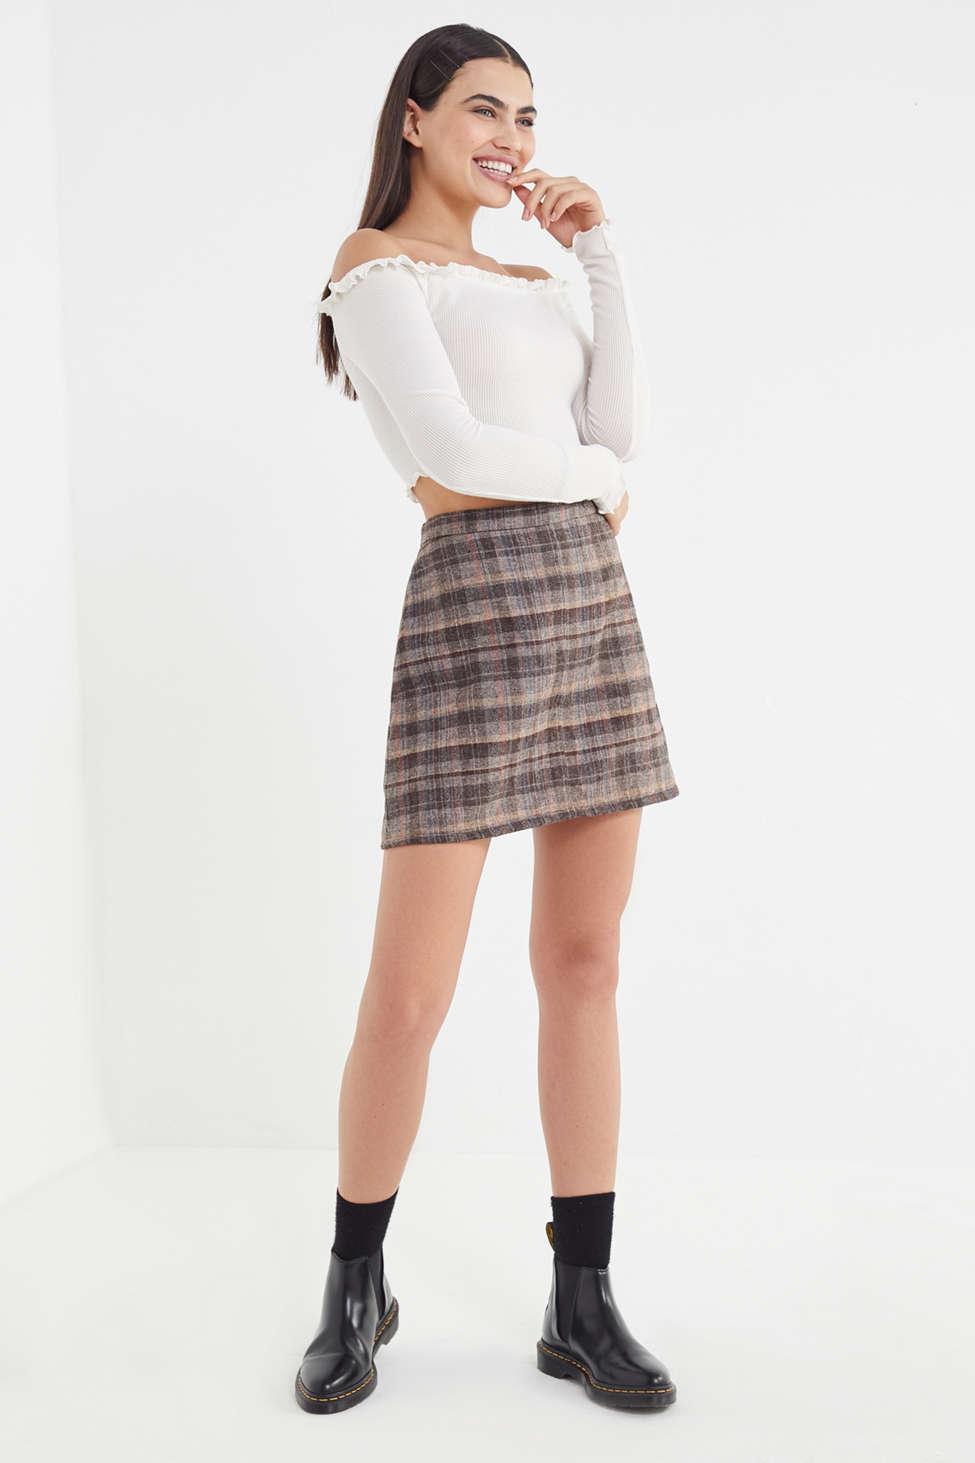 fb593a388 Urban Renewal Vintage Plaid A-line Mini Skirt in Brown - Lyst